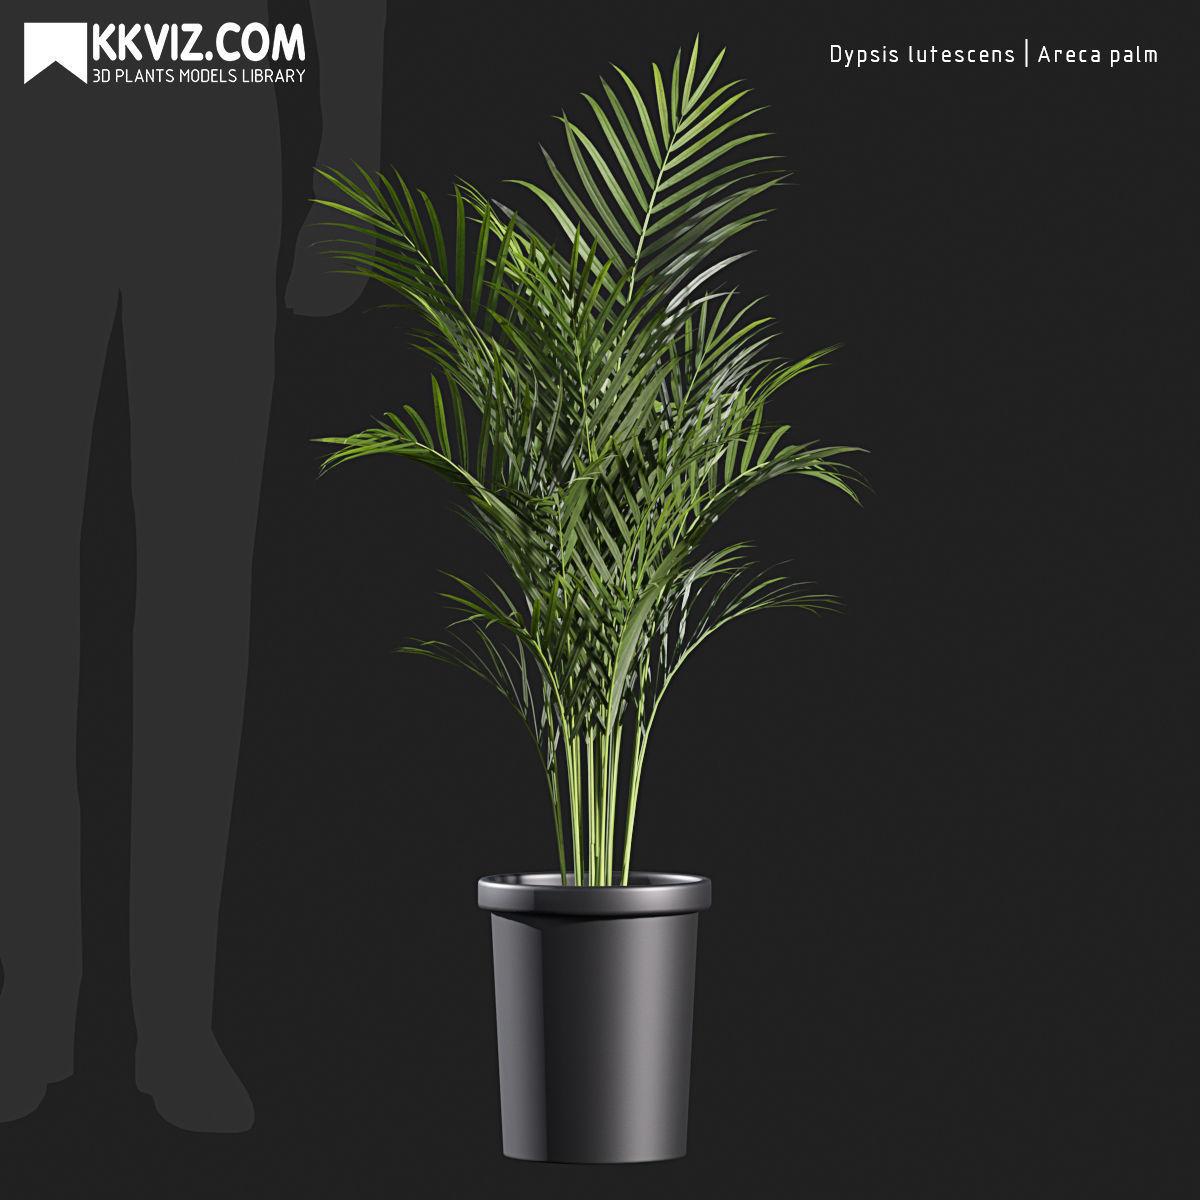 Dypsis lutescens  Areca palm-01